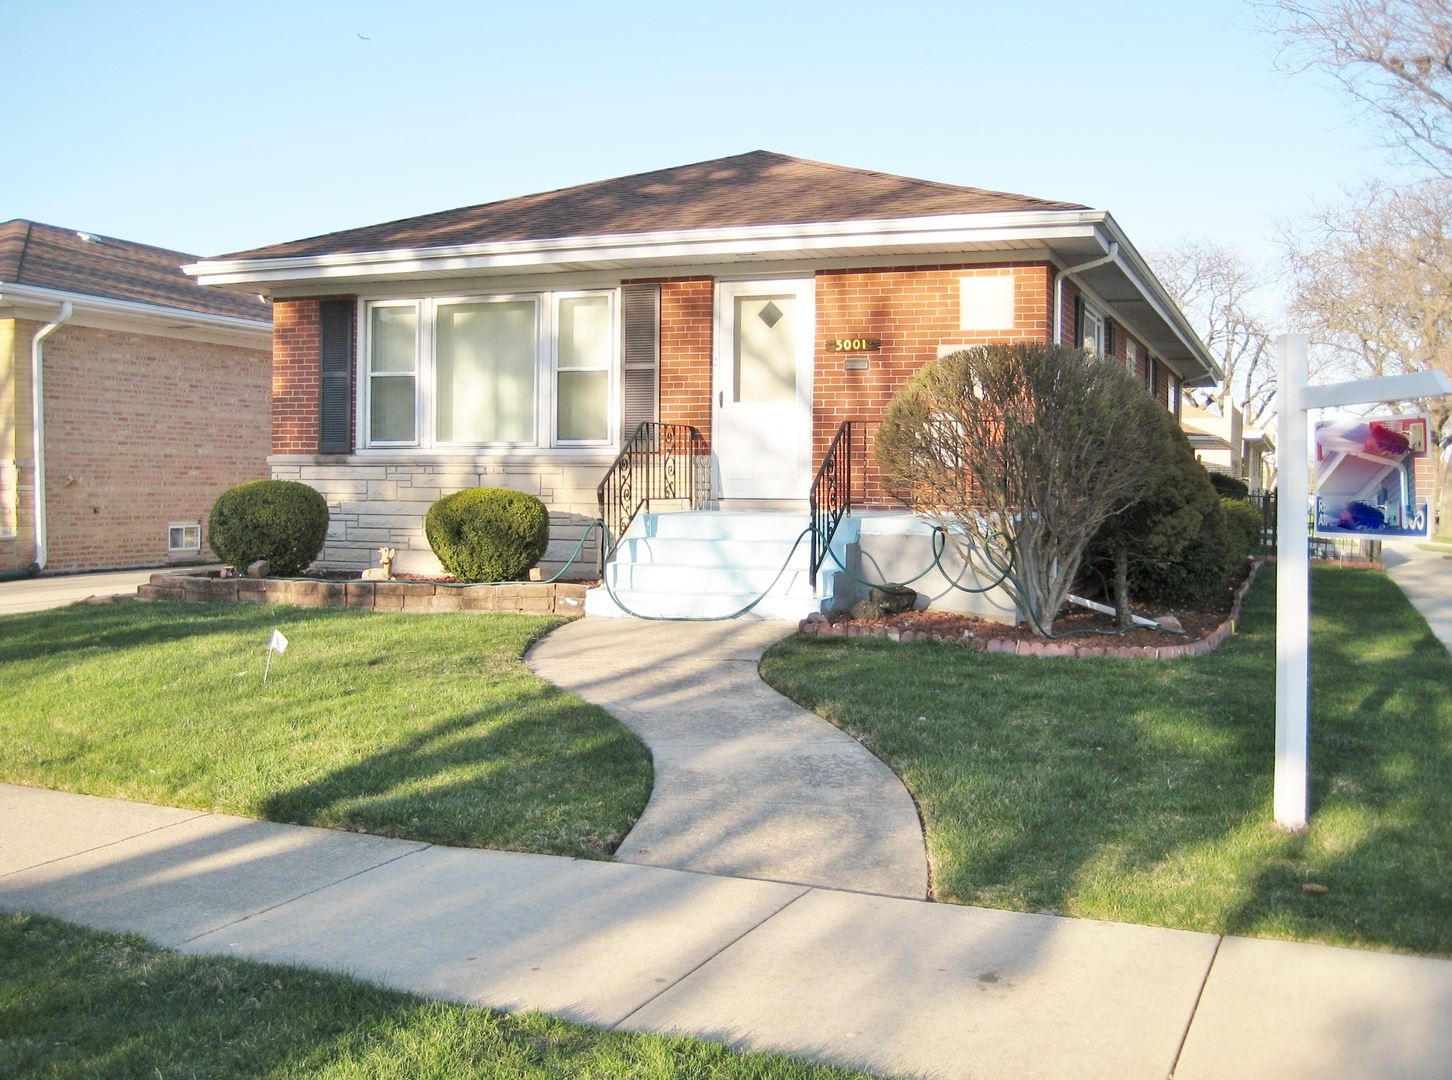 5001 N Leonard Drive, Norridge, IL 60706 - #: 11009471